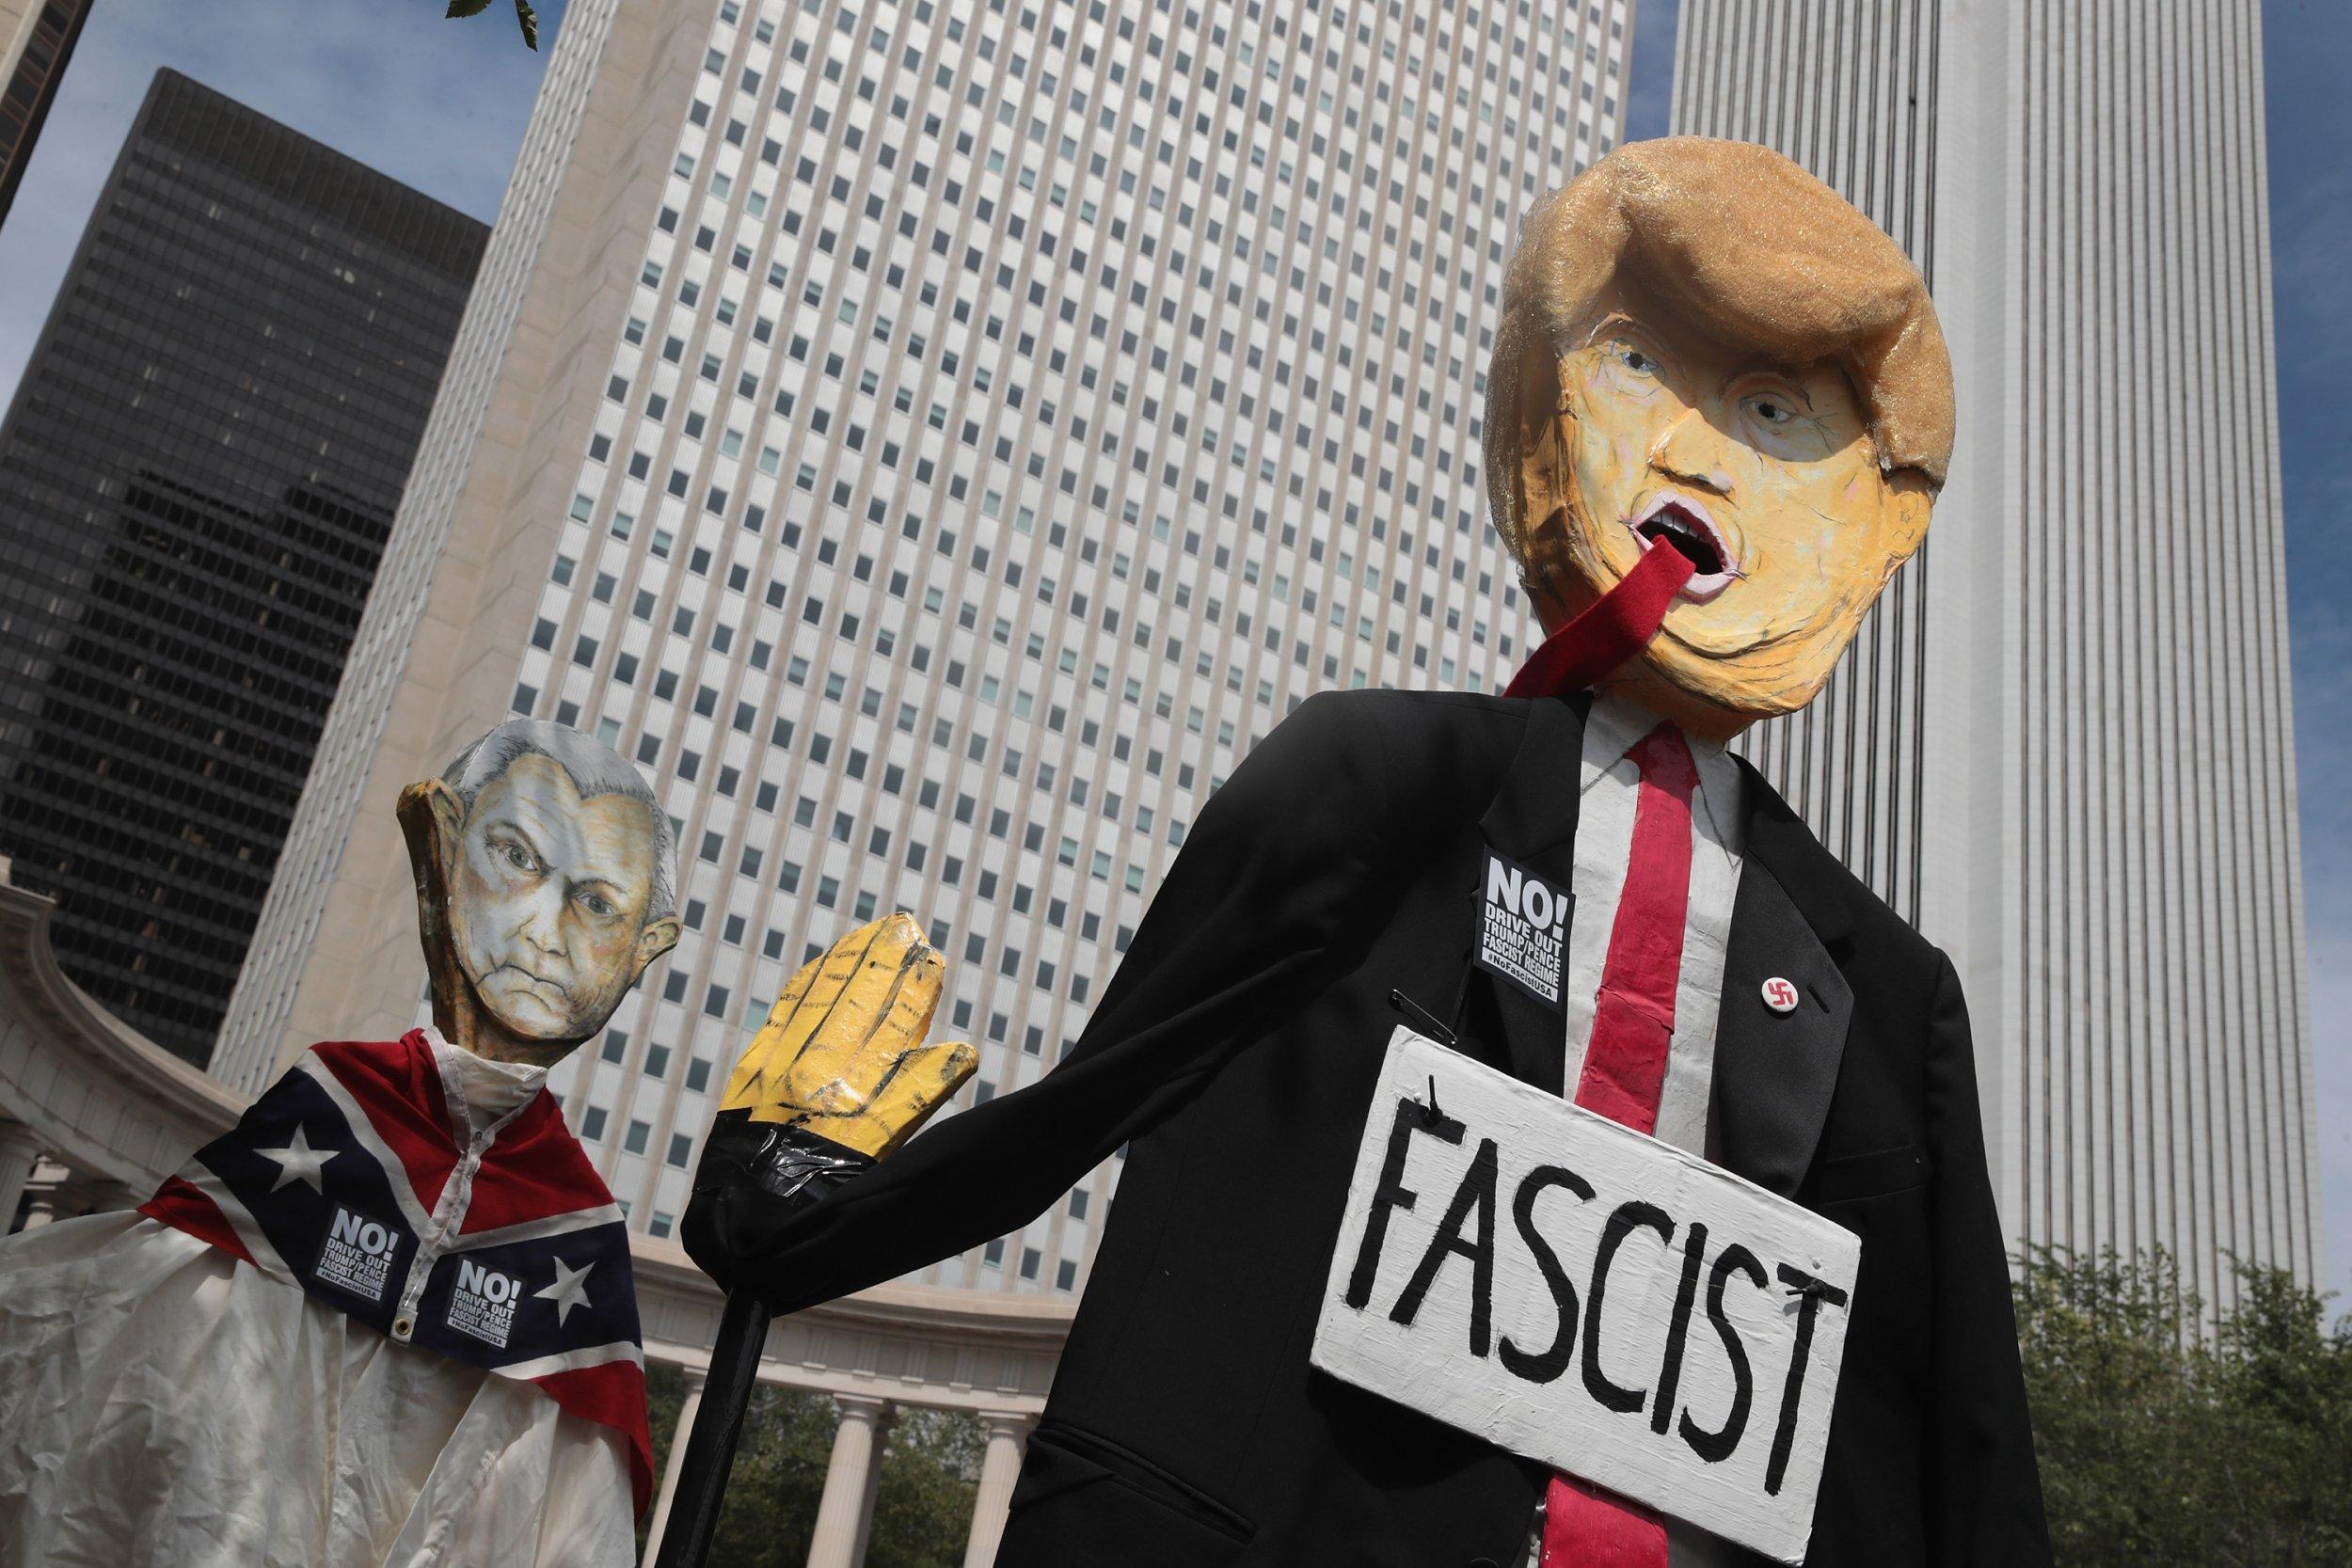 donald trump, fascism, berkeley professor, dylan riley